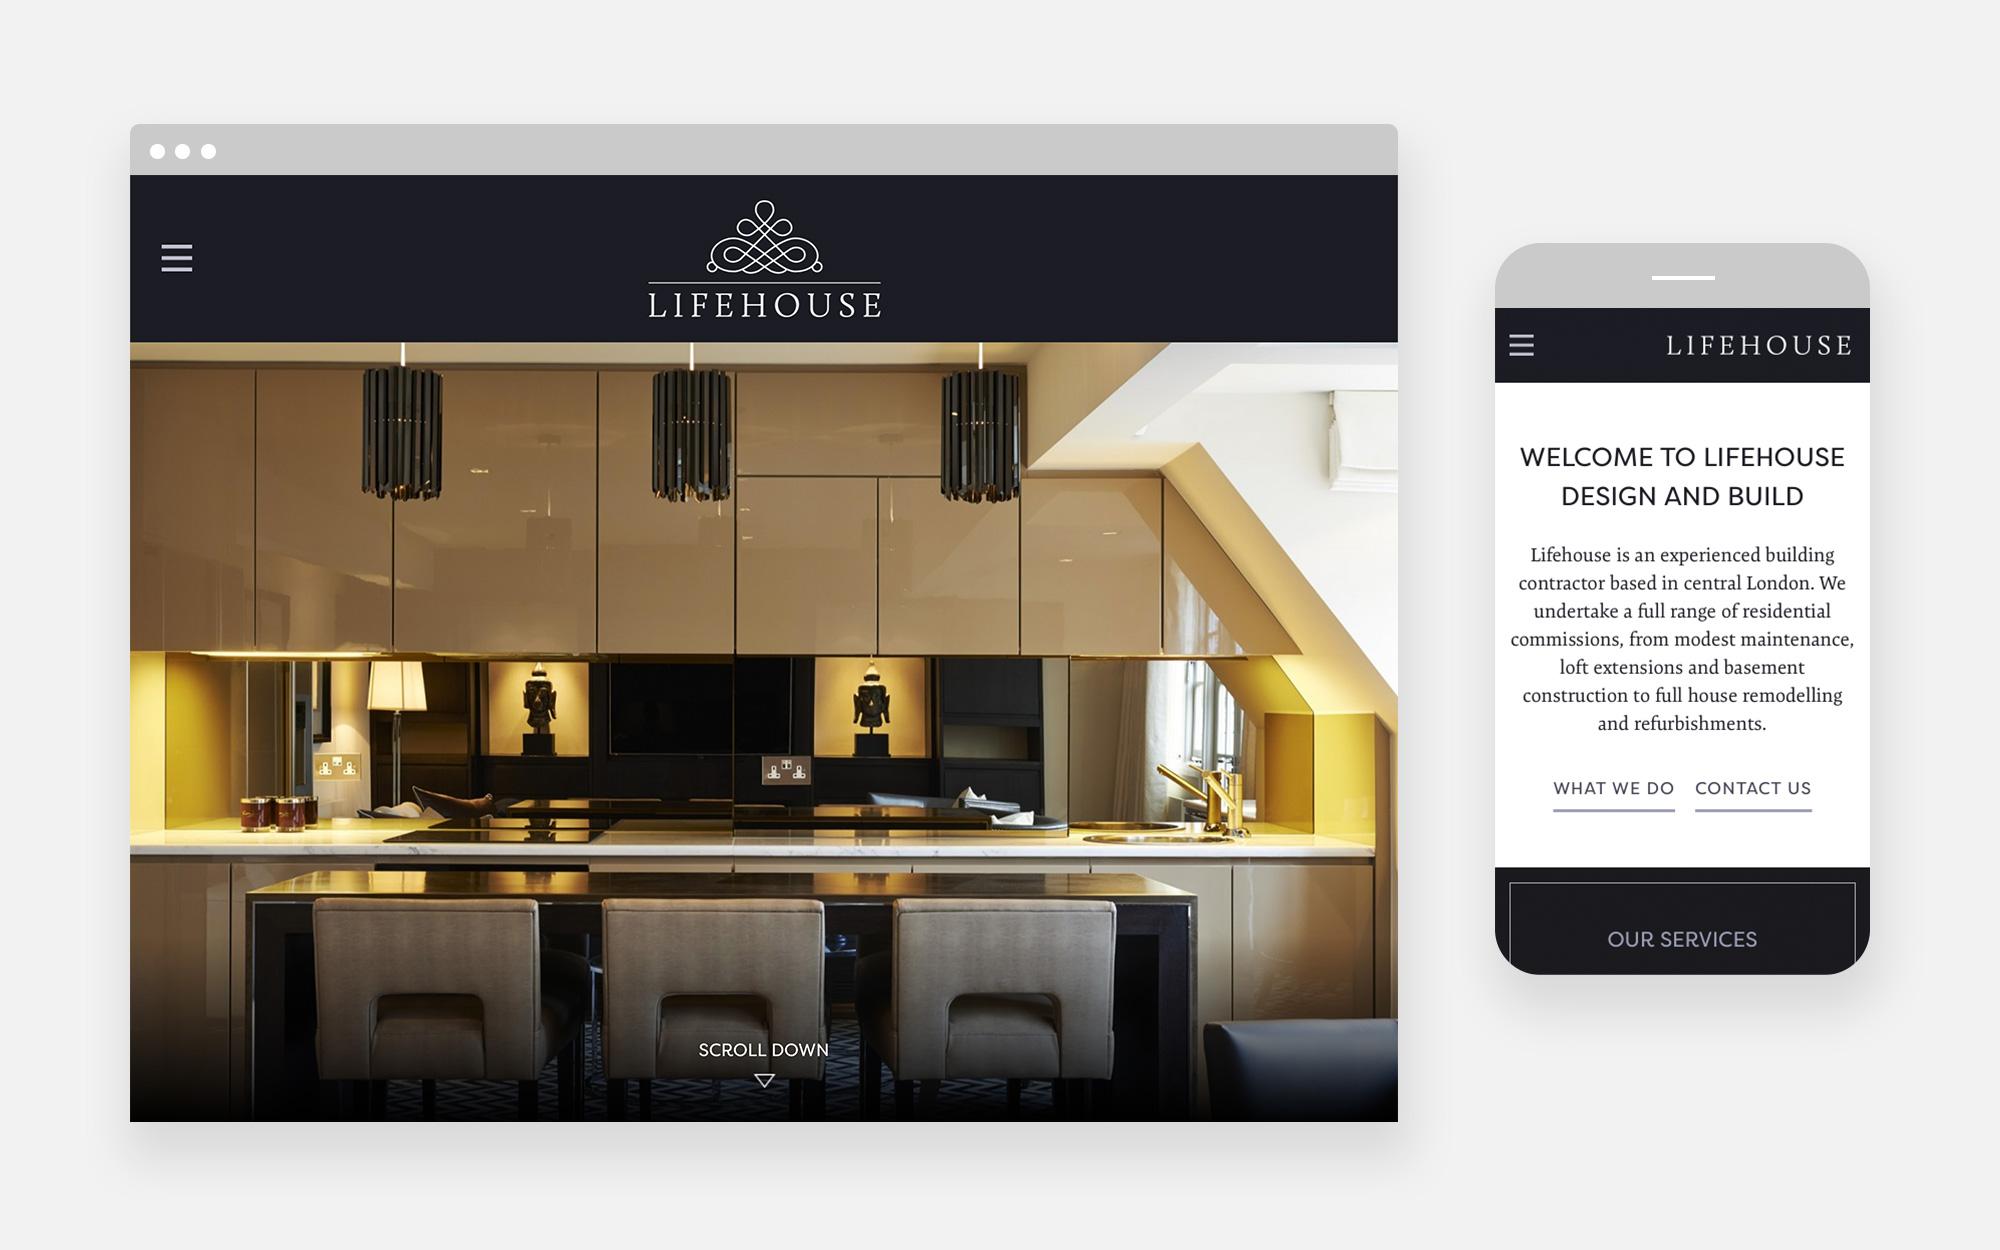 Lifehouse website design 1